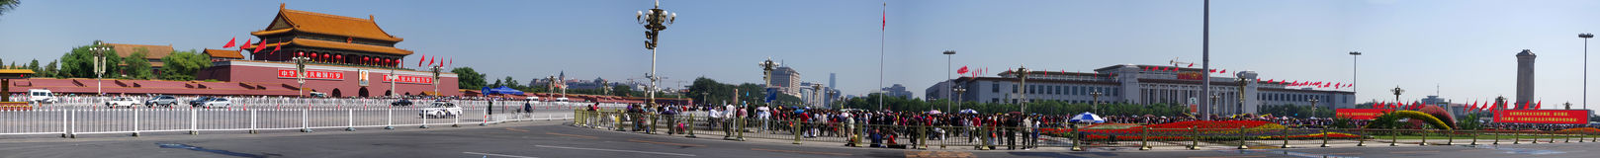 Pekin panoramiczny widok Tiananmen Zdjęcia Royalty Free